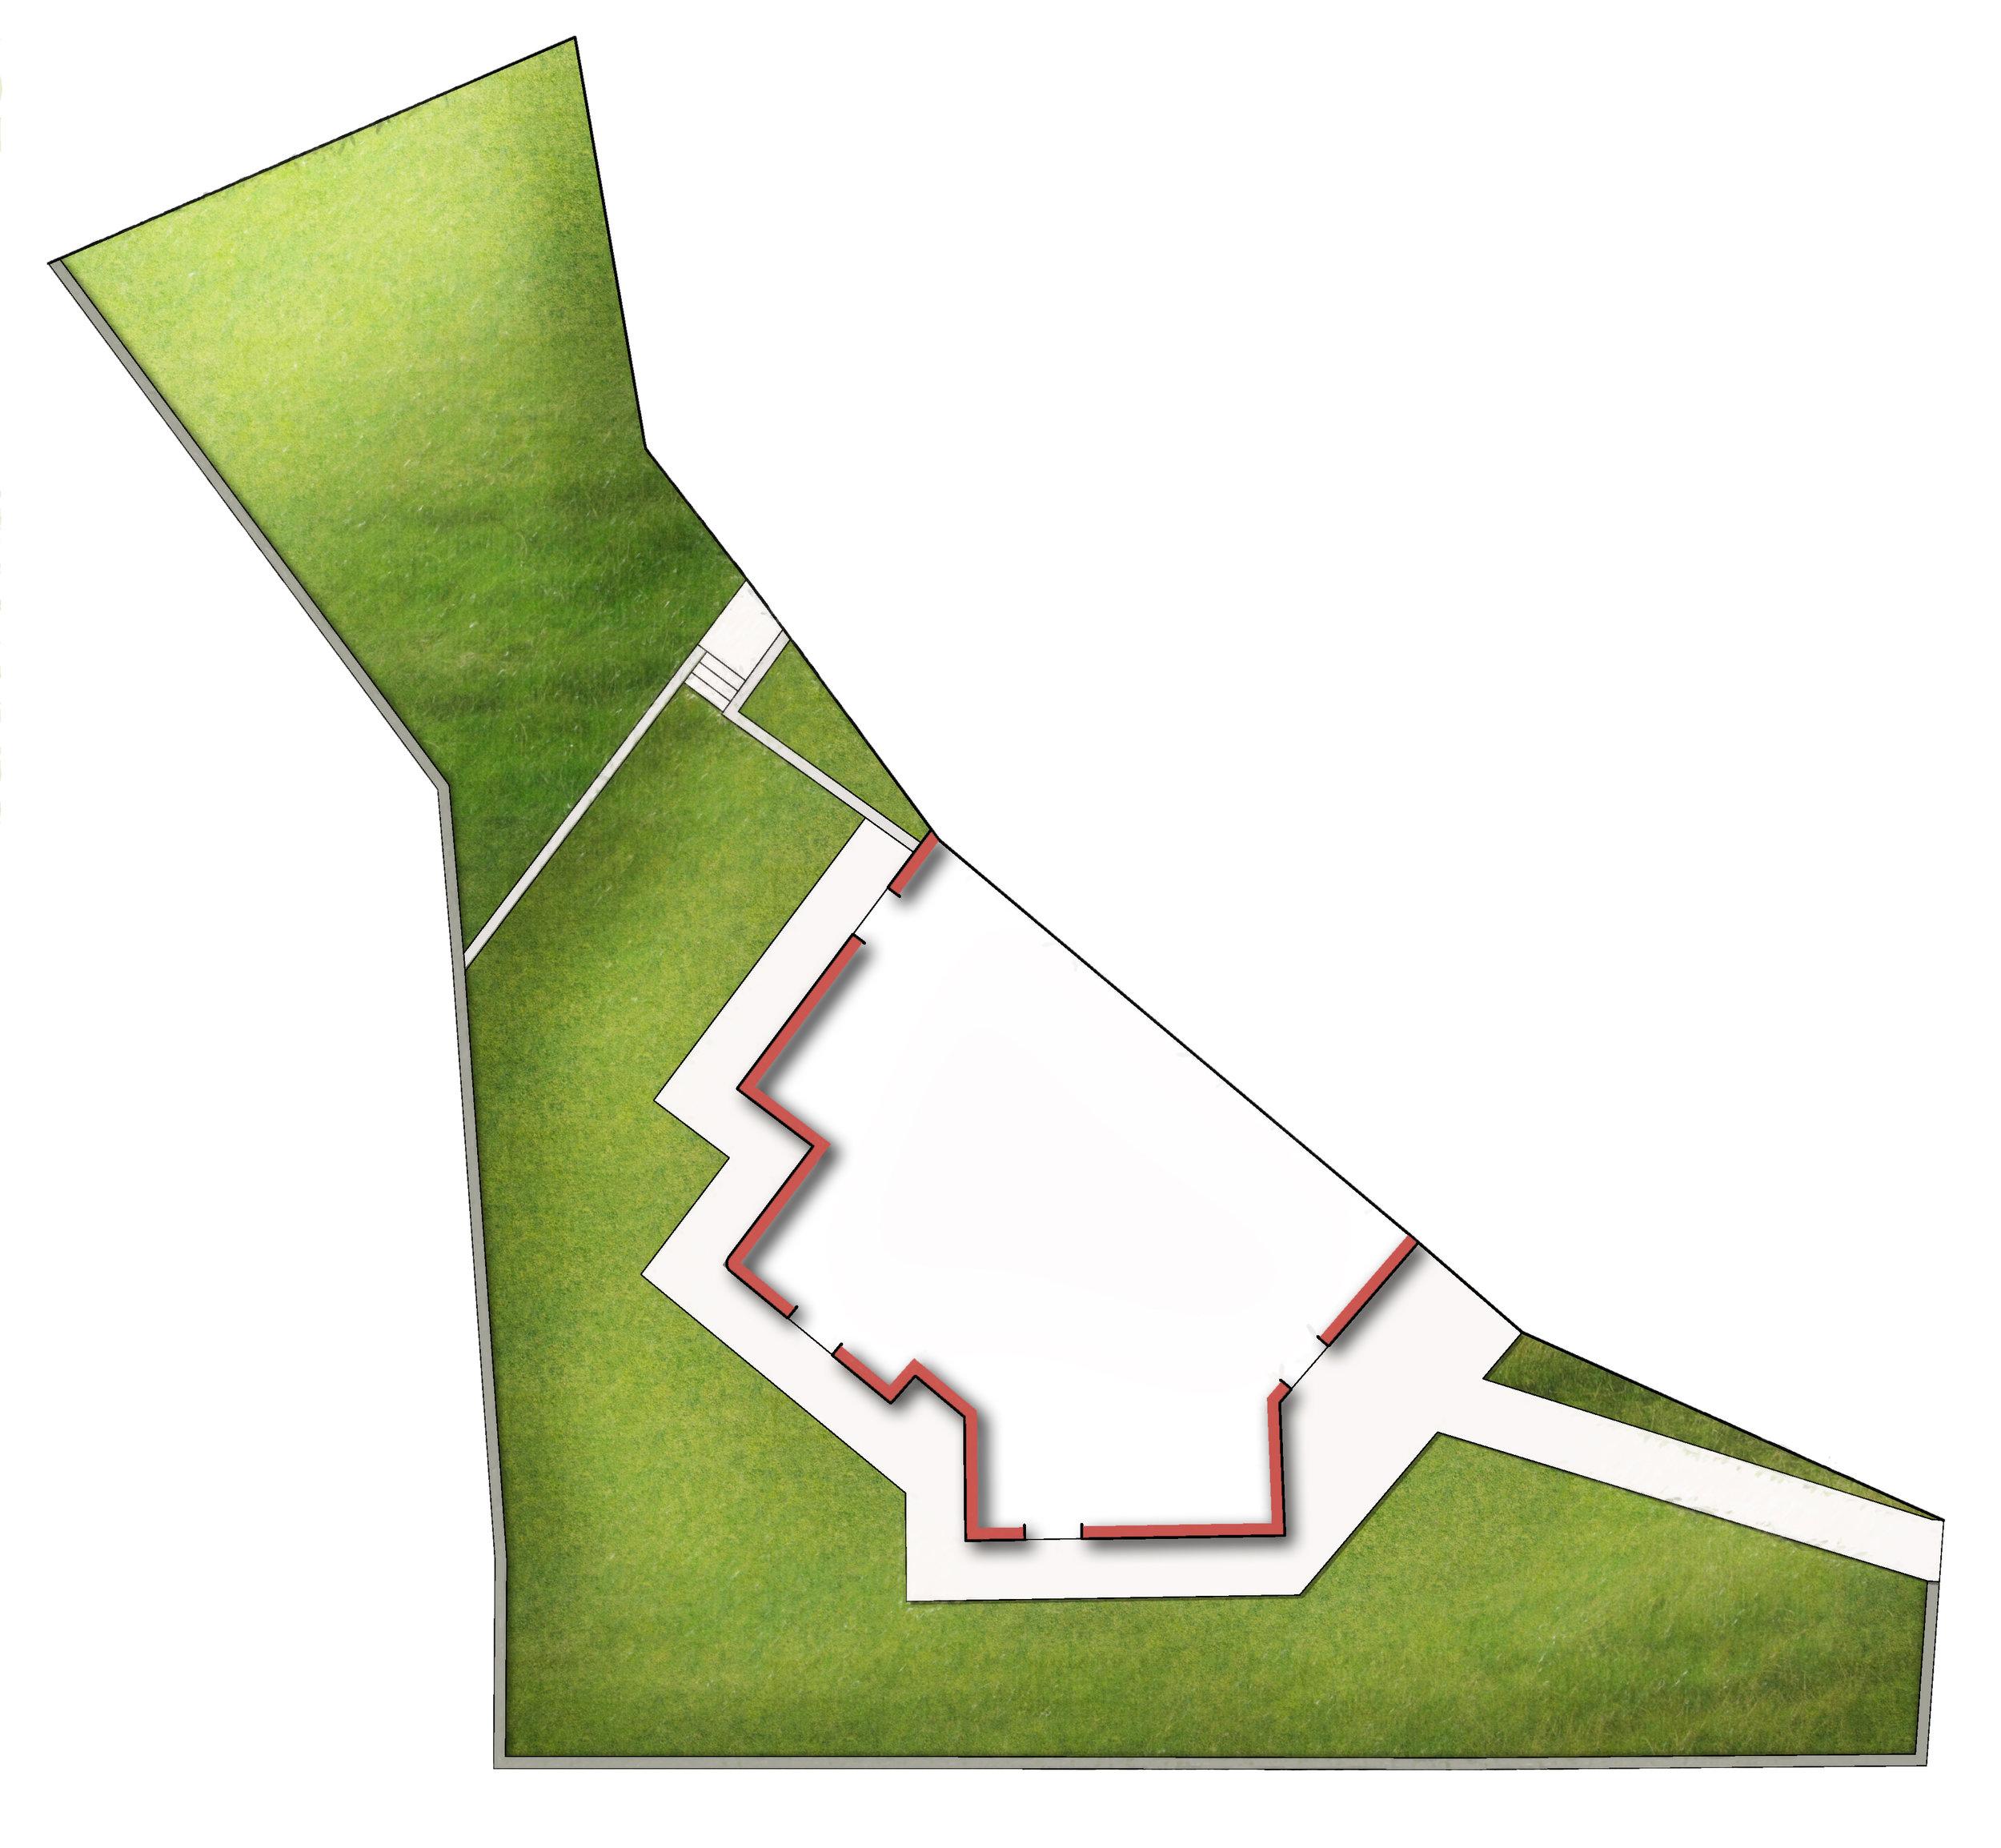 giardino_privato_planimetria